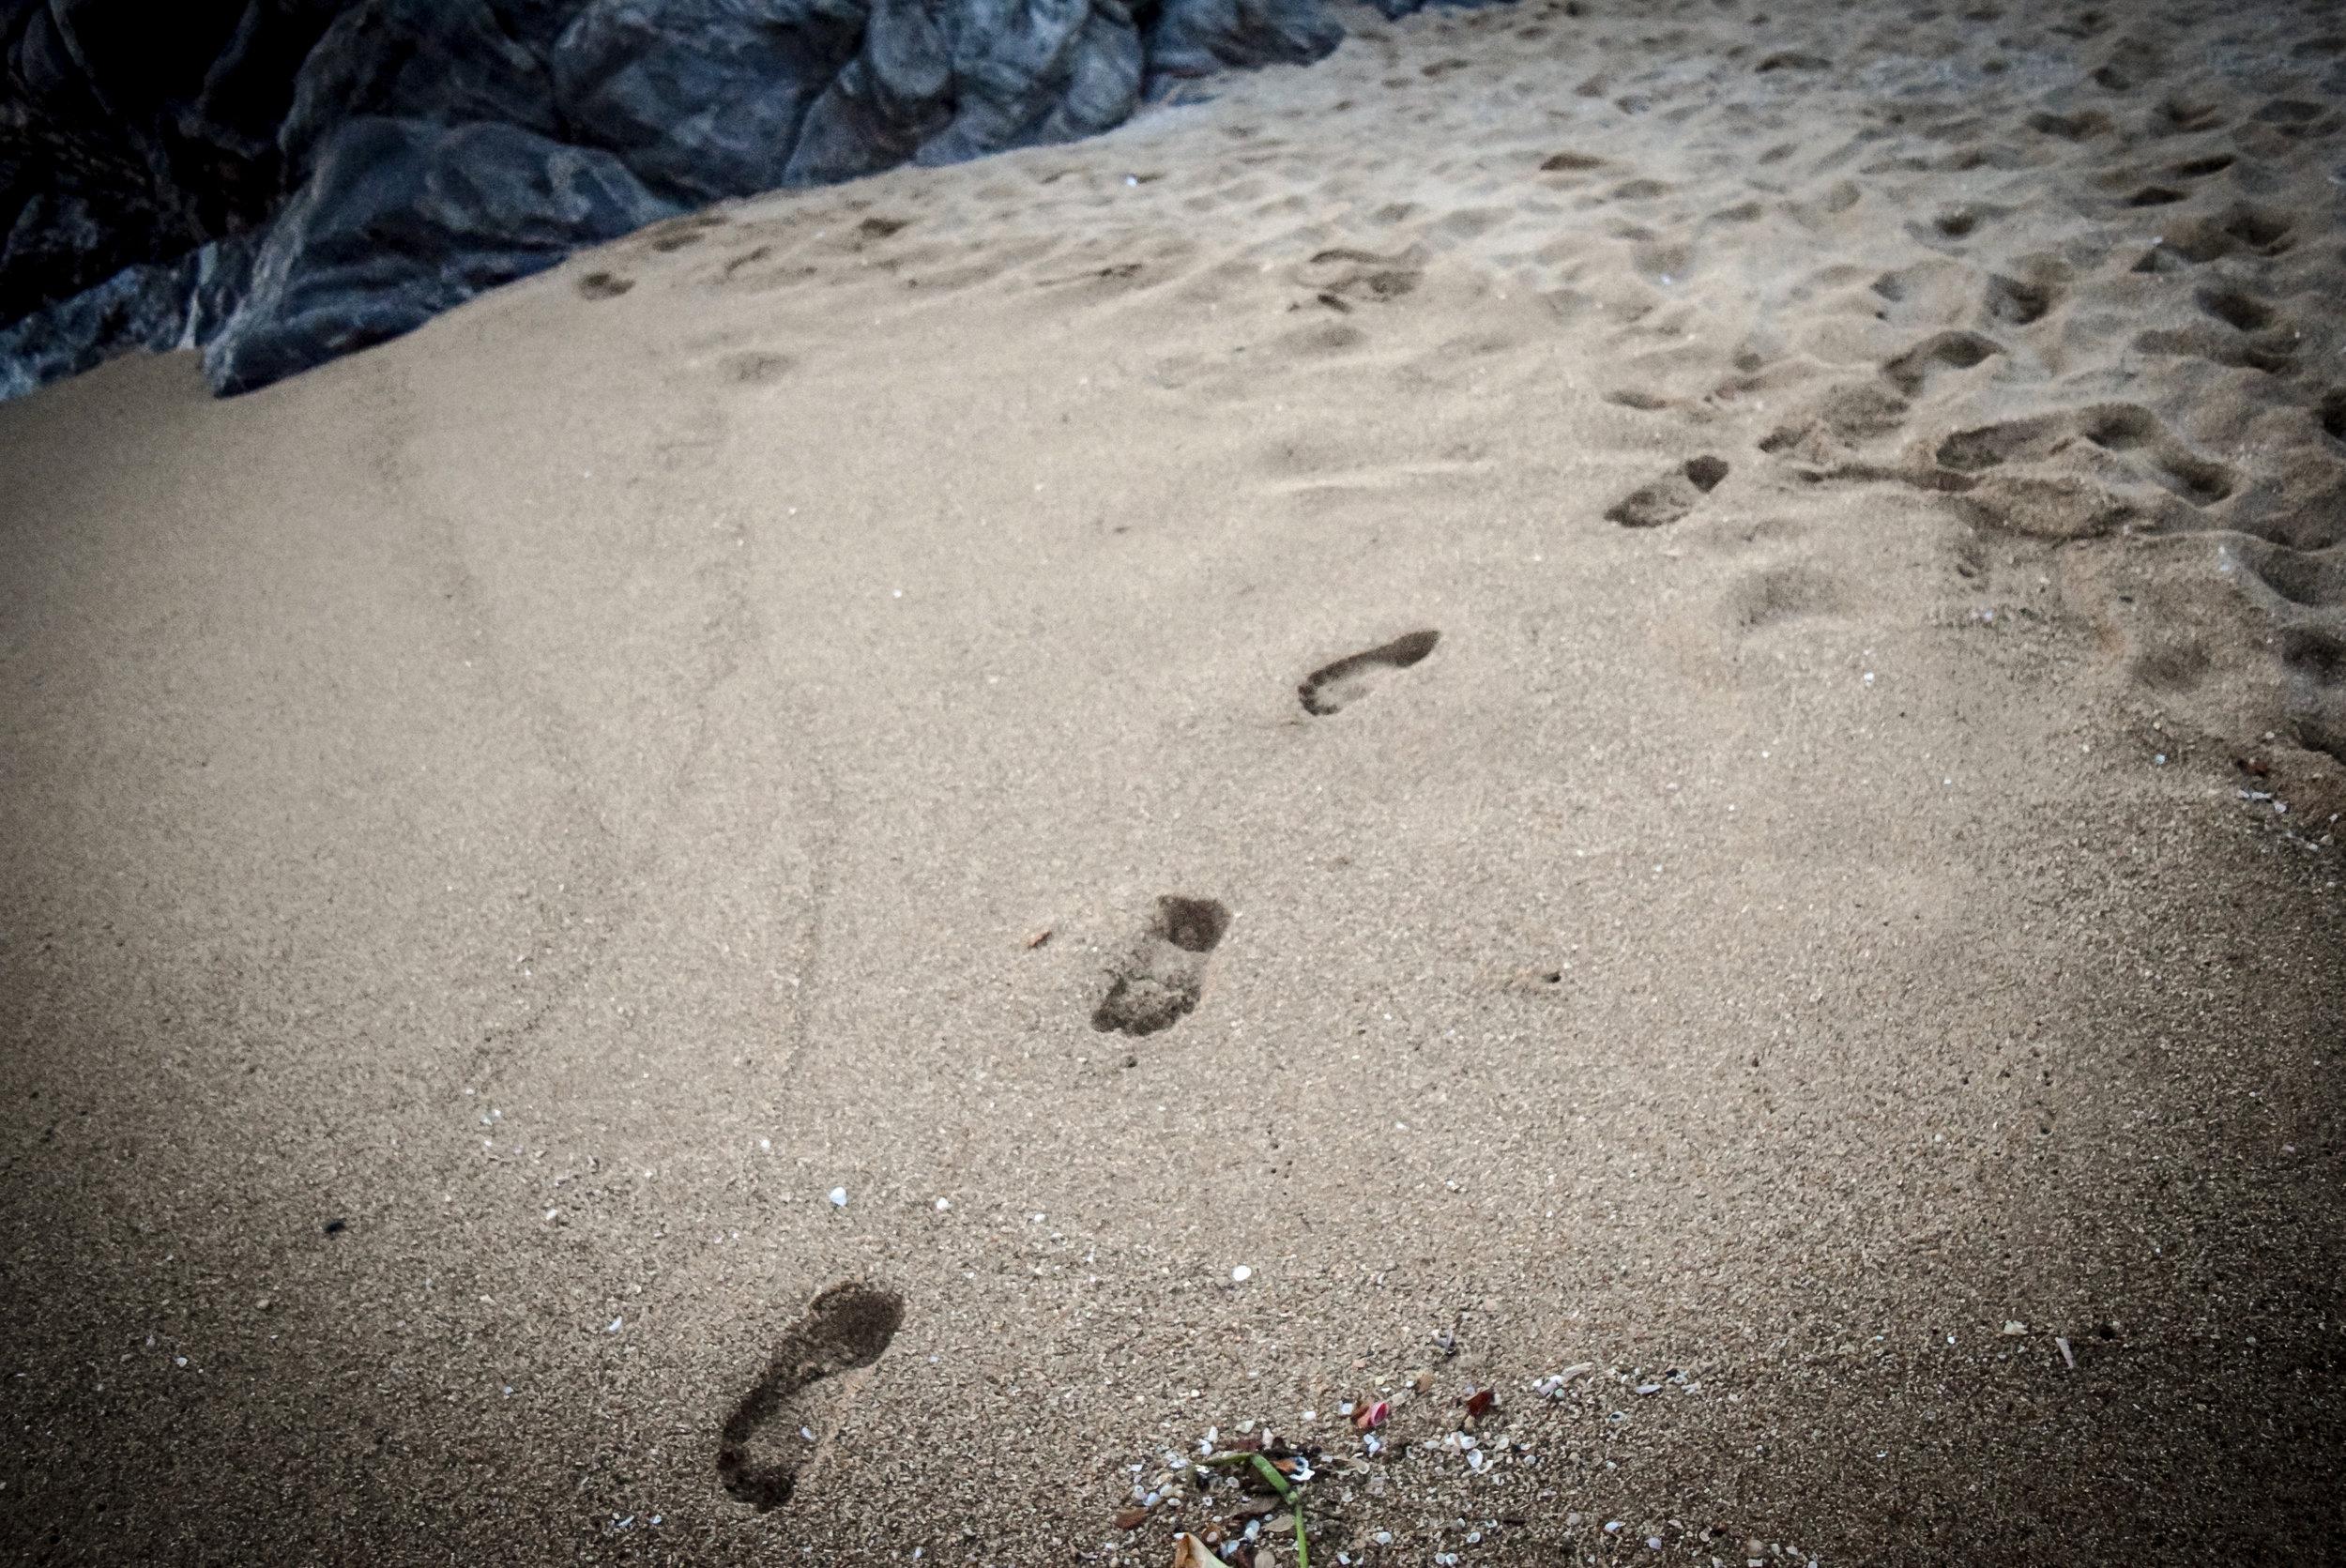 Footsteps in the sand at Playa Zipolite